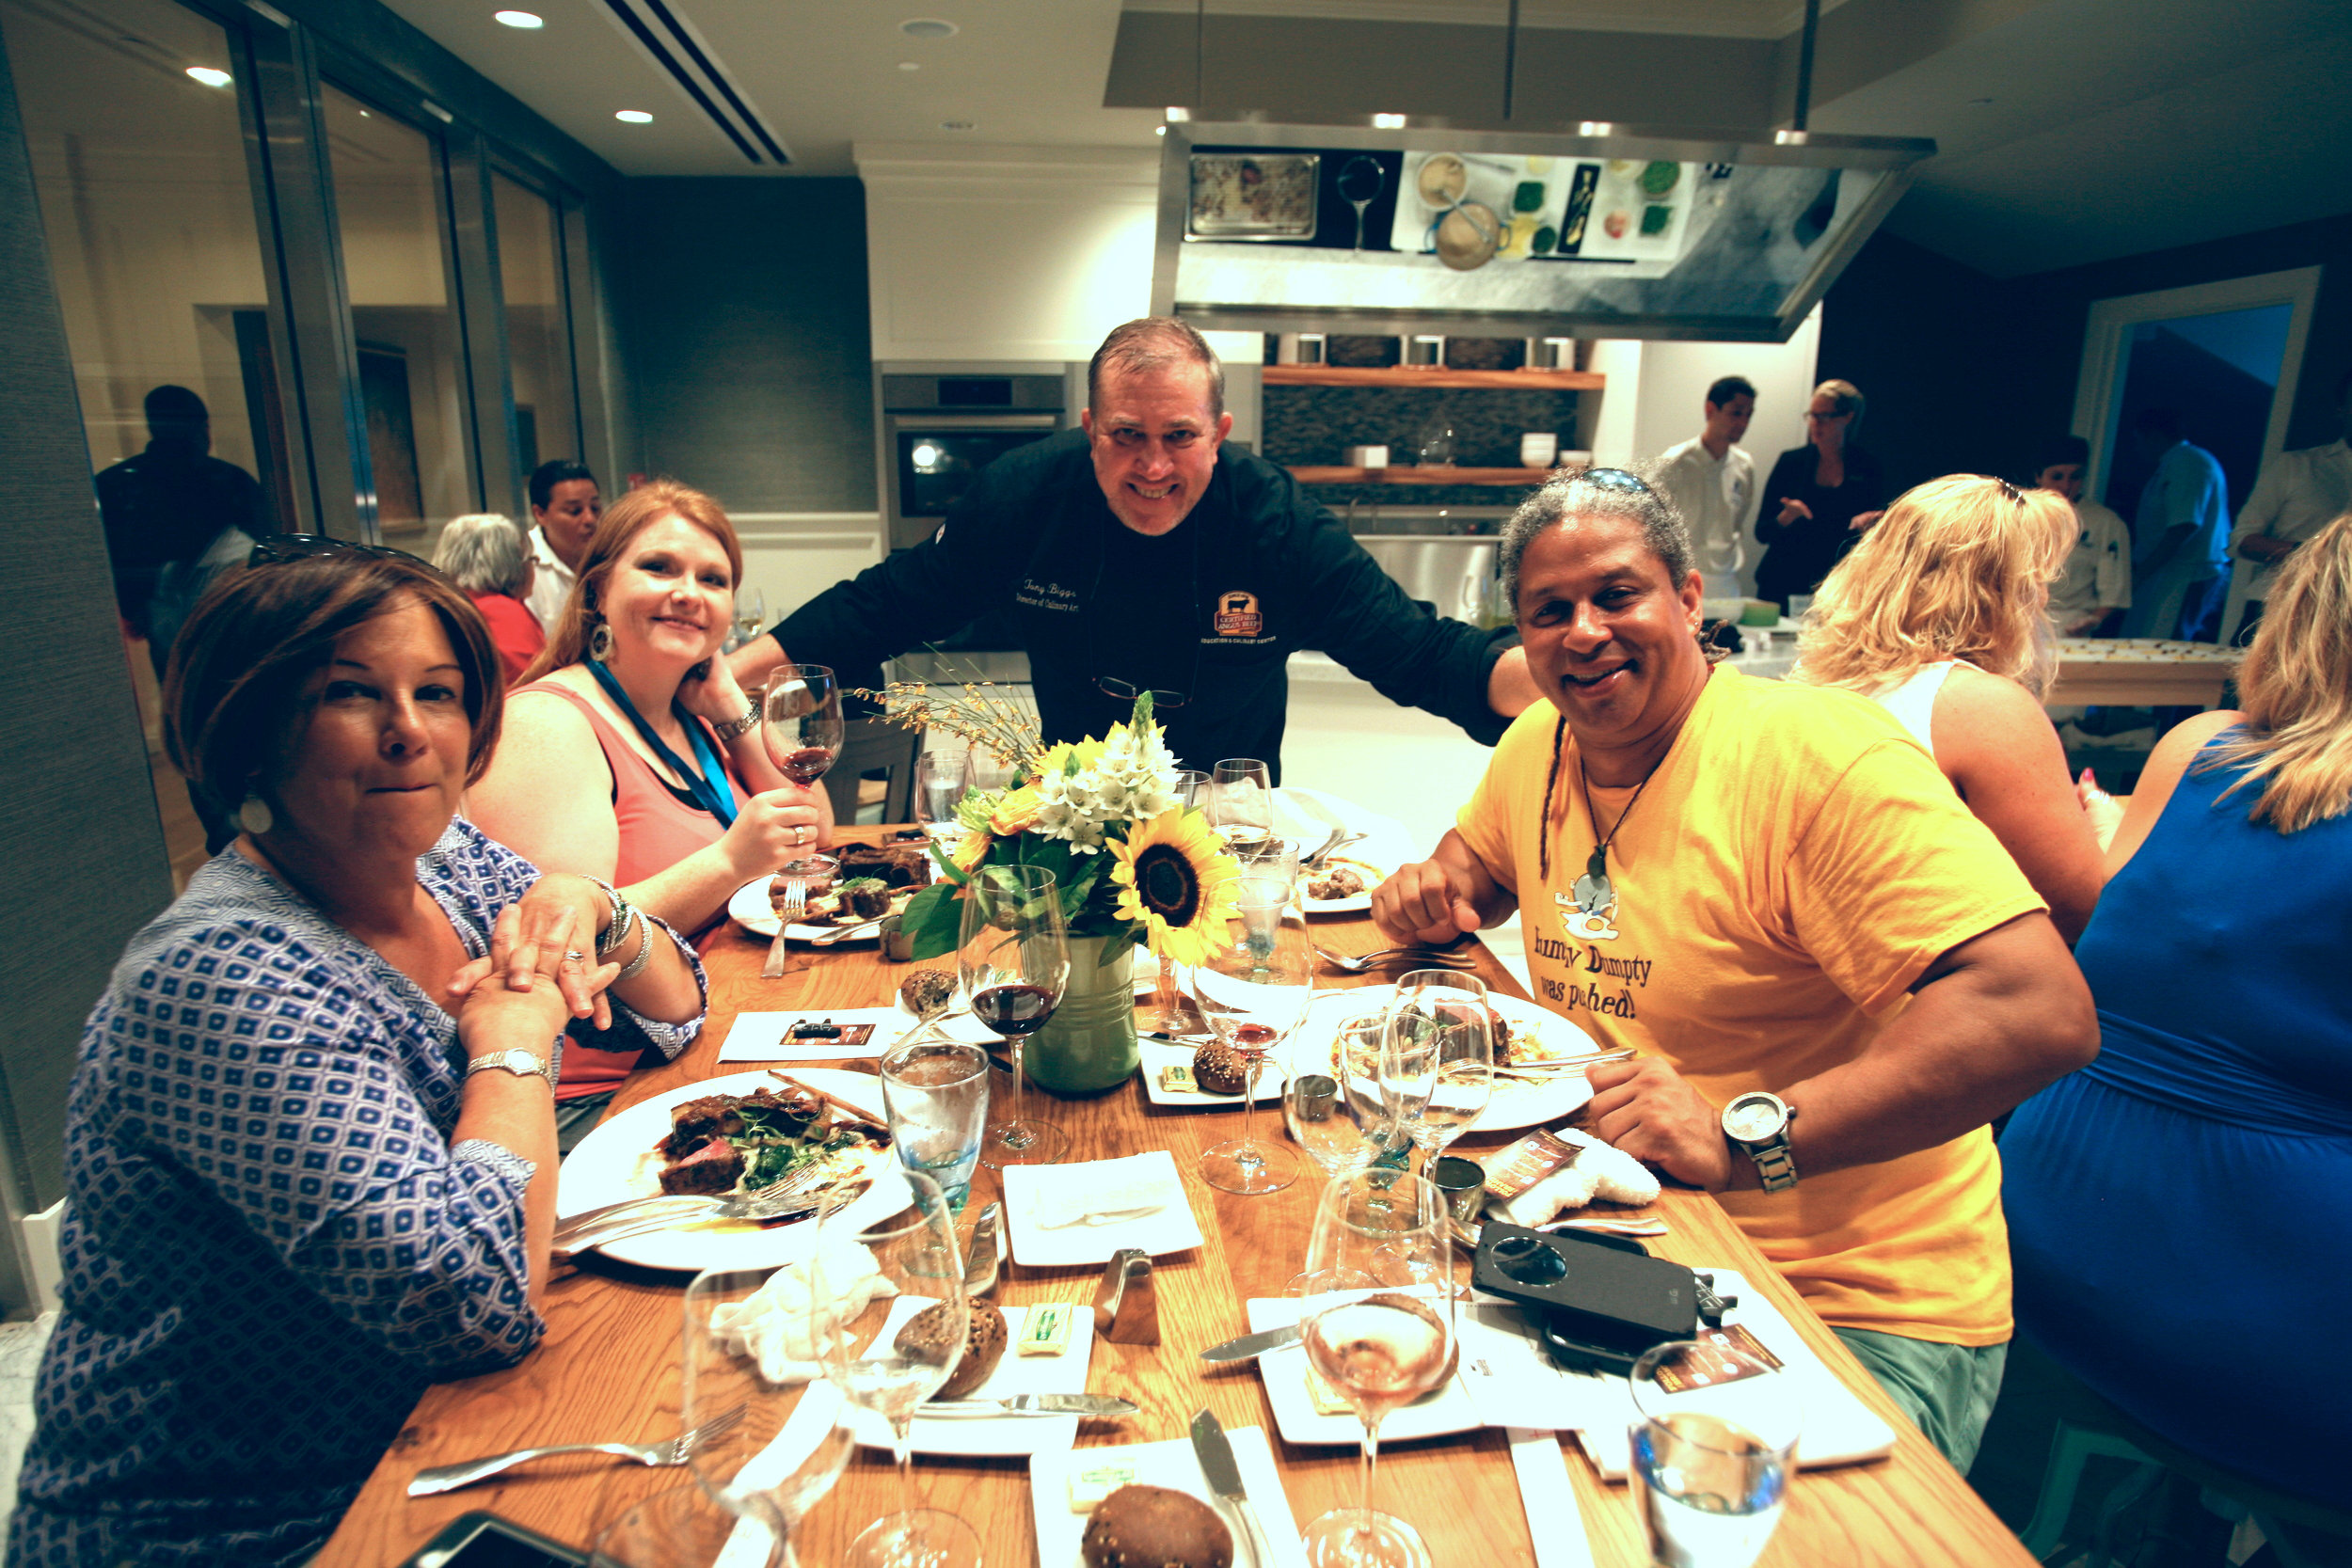 Cindy Hudson, Tara, Chef Tony Biggs, Delius Shirley